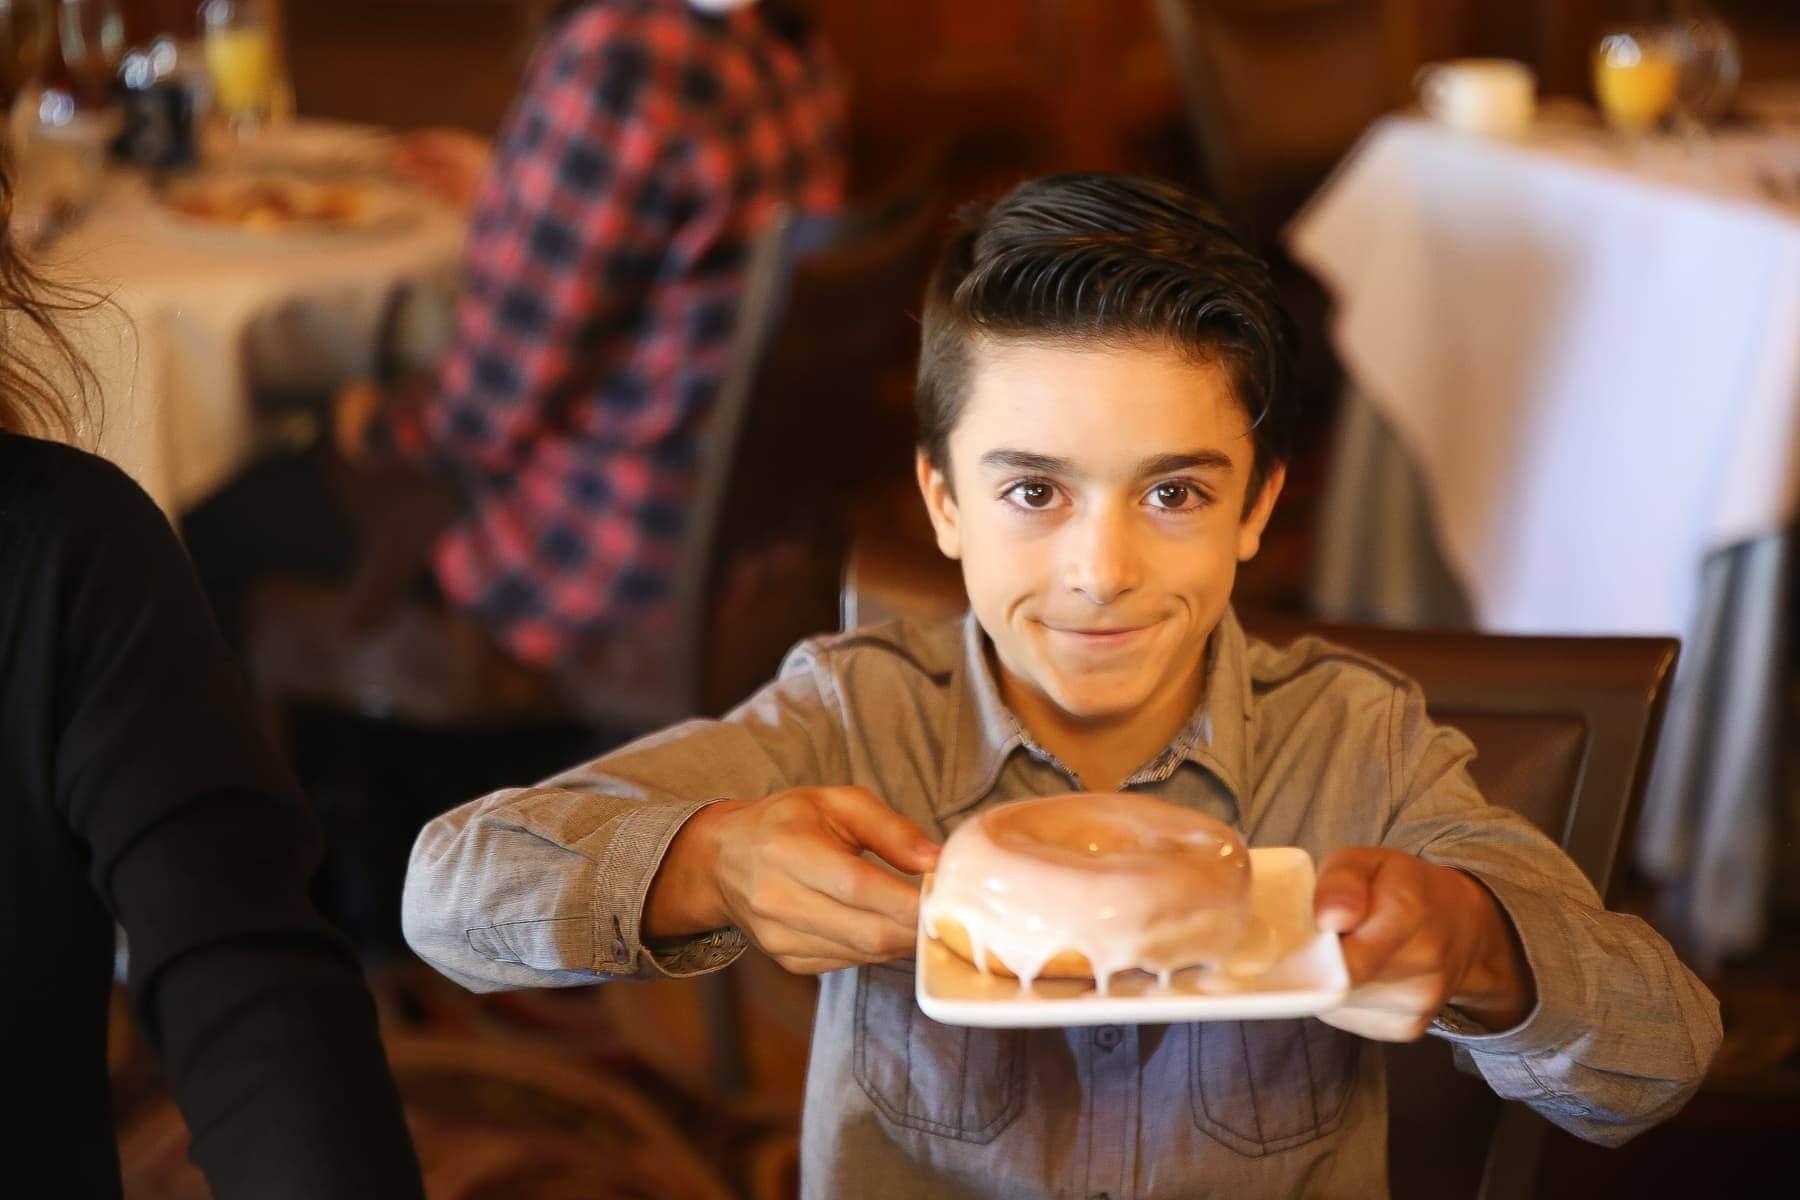 boy holding doughnut